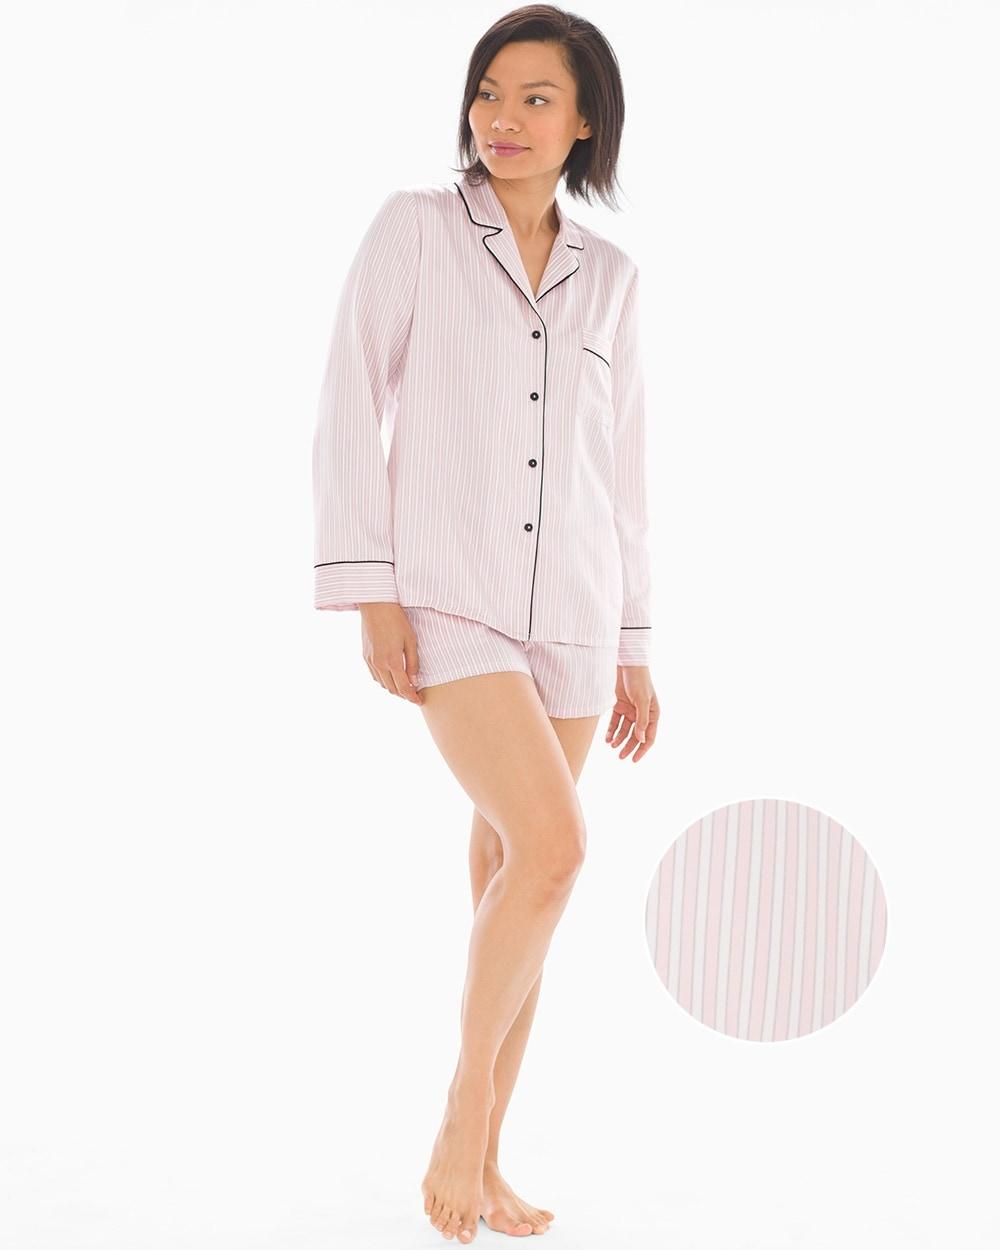 Shop Pajama Sets for Women - Sleepwear for Women - Soma 322596edd